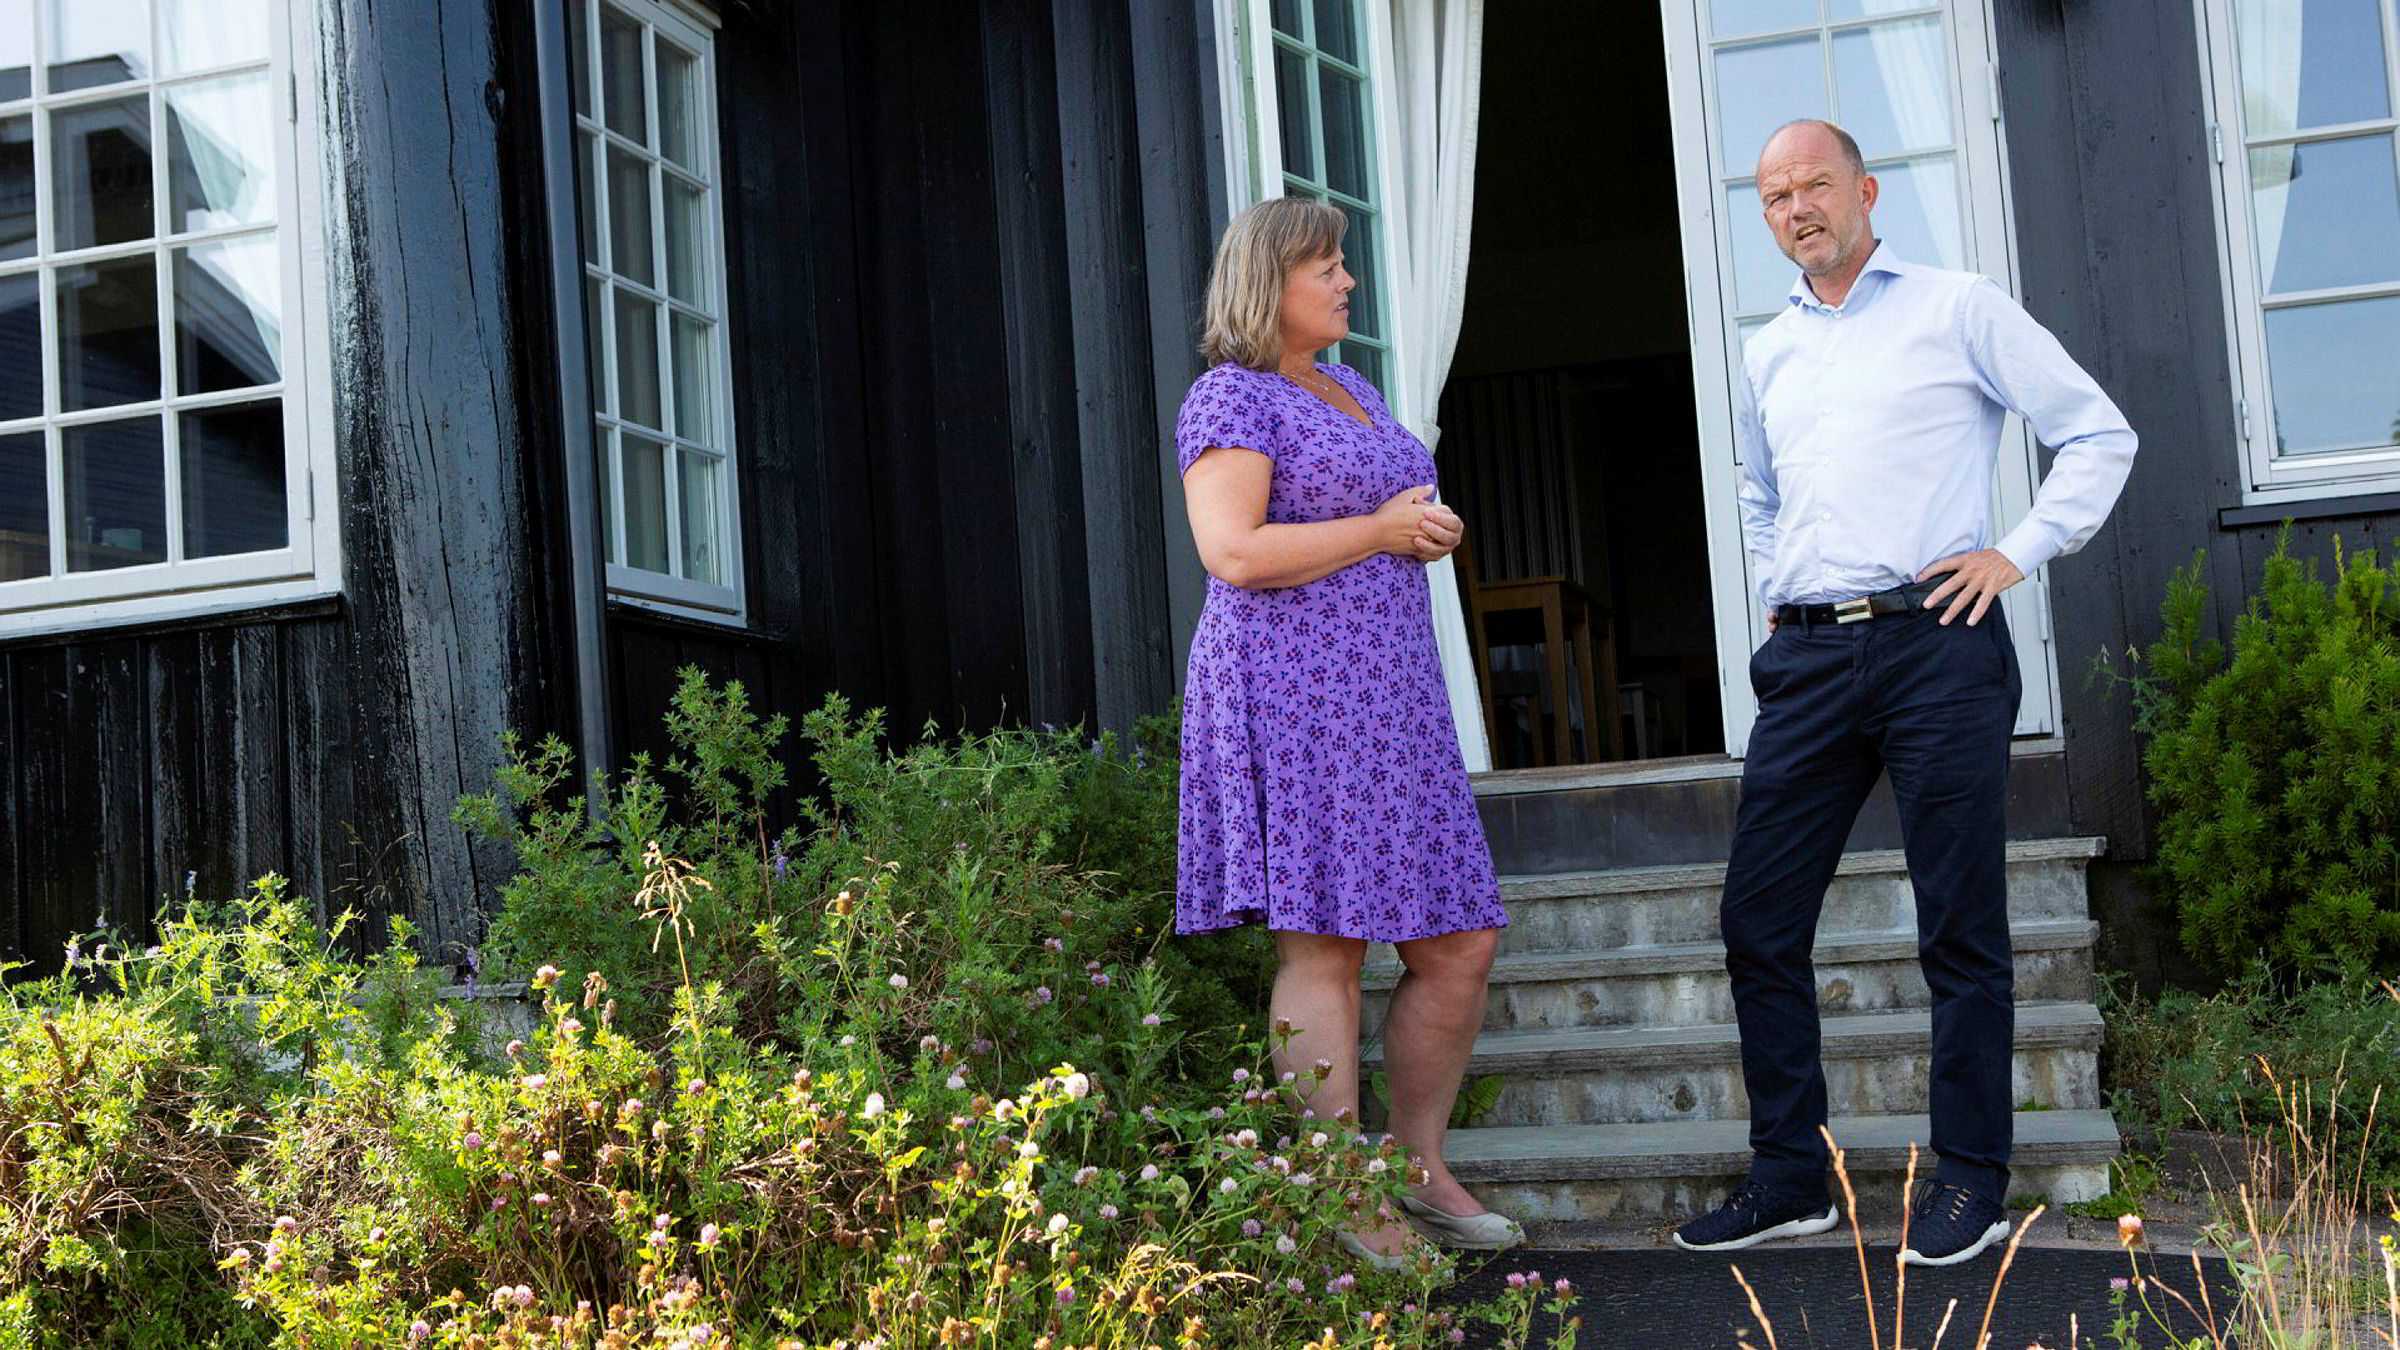 Hotellsjef Merete Emanuelsen tar imot NHO-sjef Ole Erik Almlid på nedstengte Leangkollen konferansehotell.